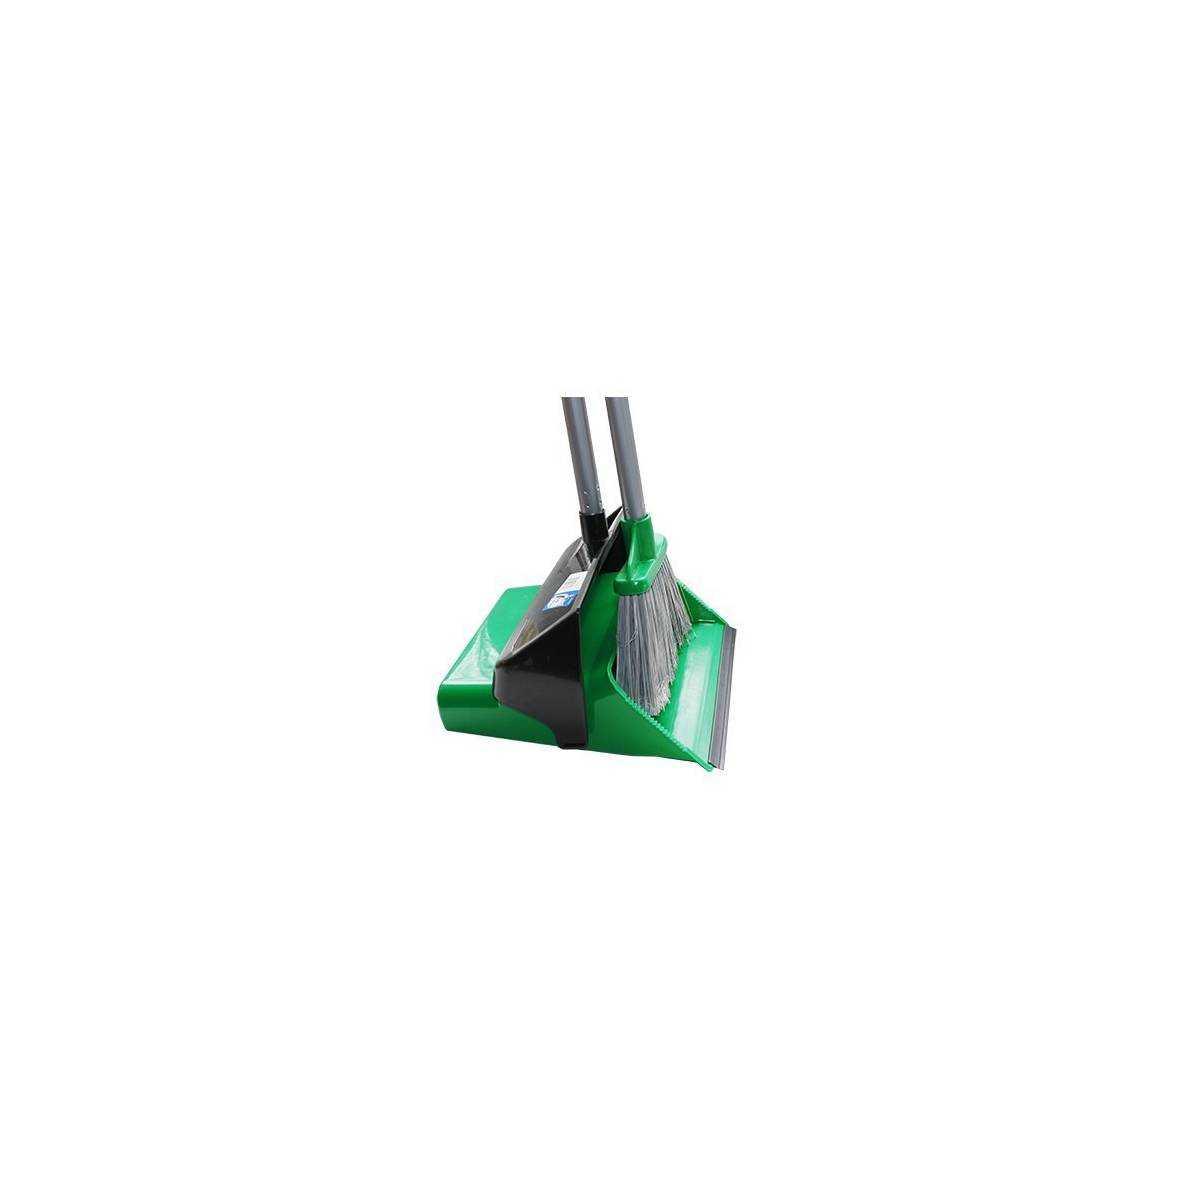 Набор для уборки совок+щетка DUSTER SET (Зеленого цвета) 12.00825.0006.04.071 APEX - Fratelli Re SpA